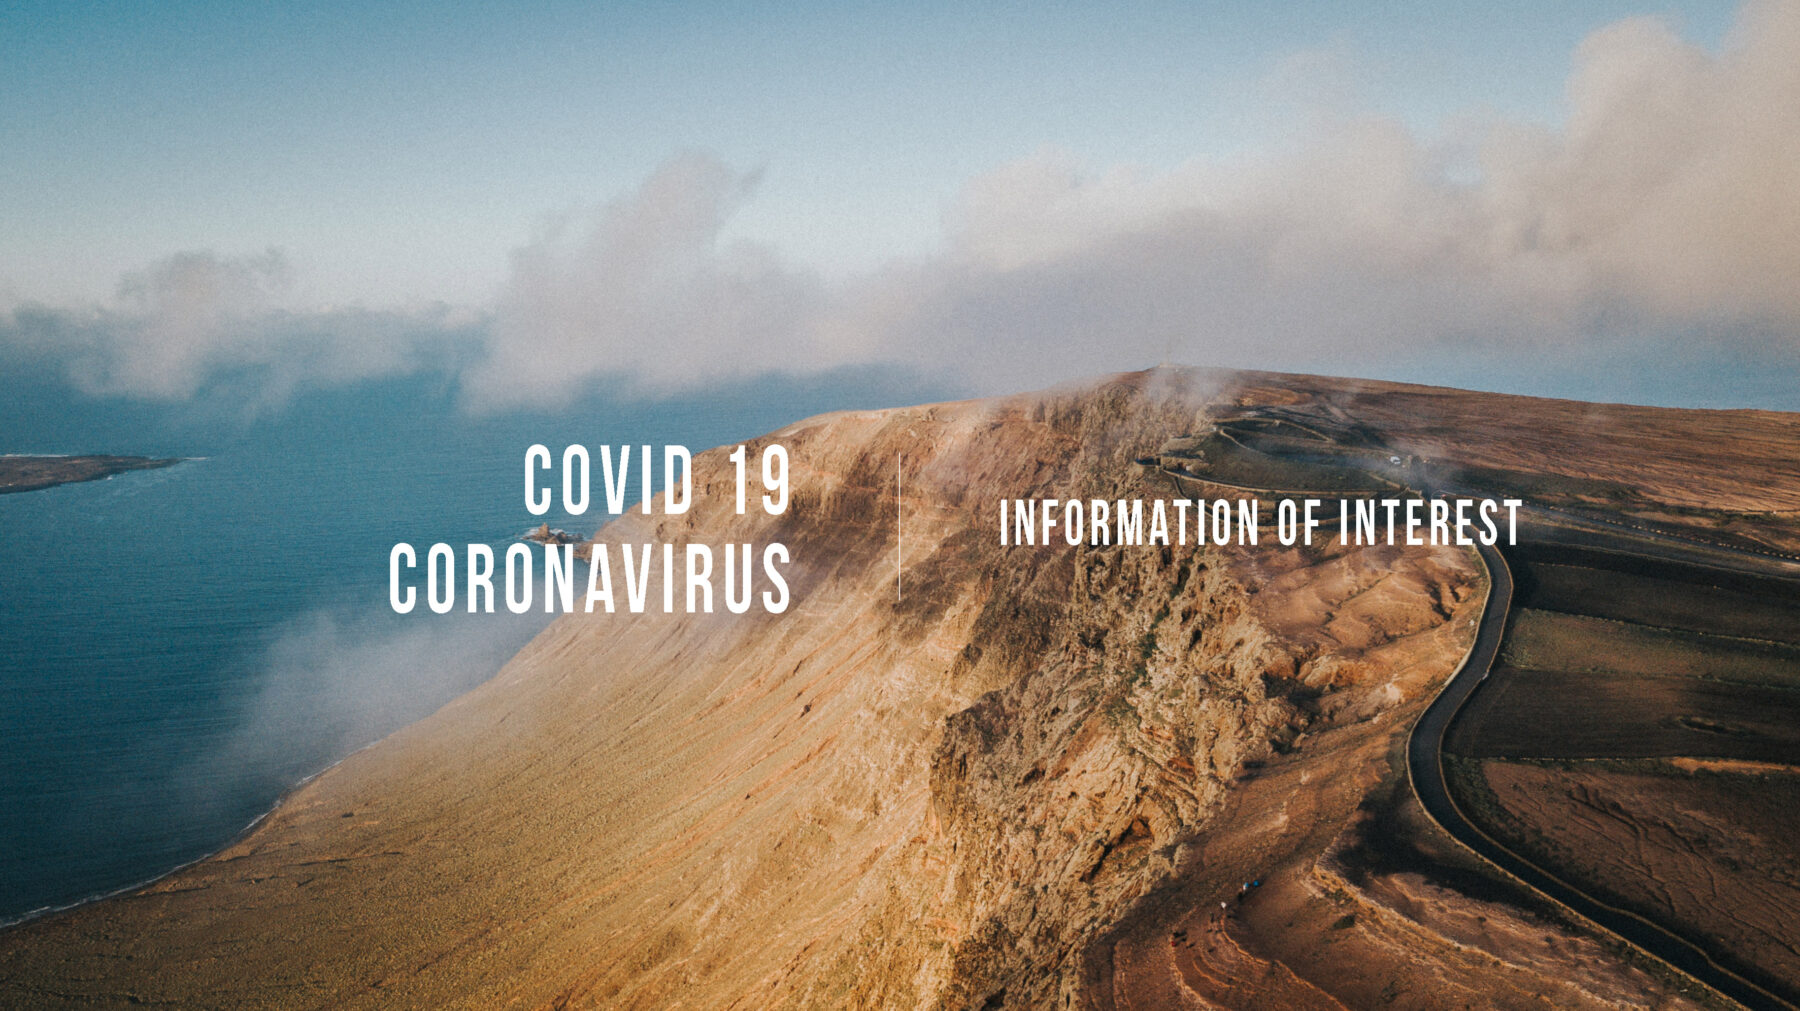 CORONAVIRUS - COVID 19. Information of interest. - Turismo ...